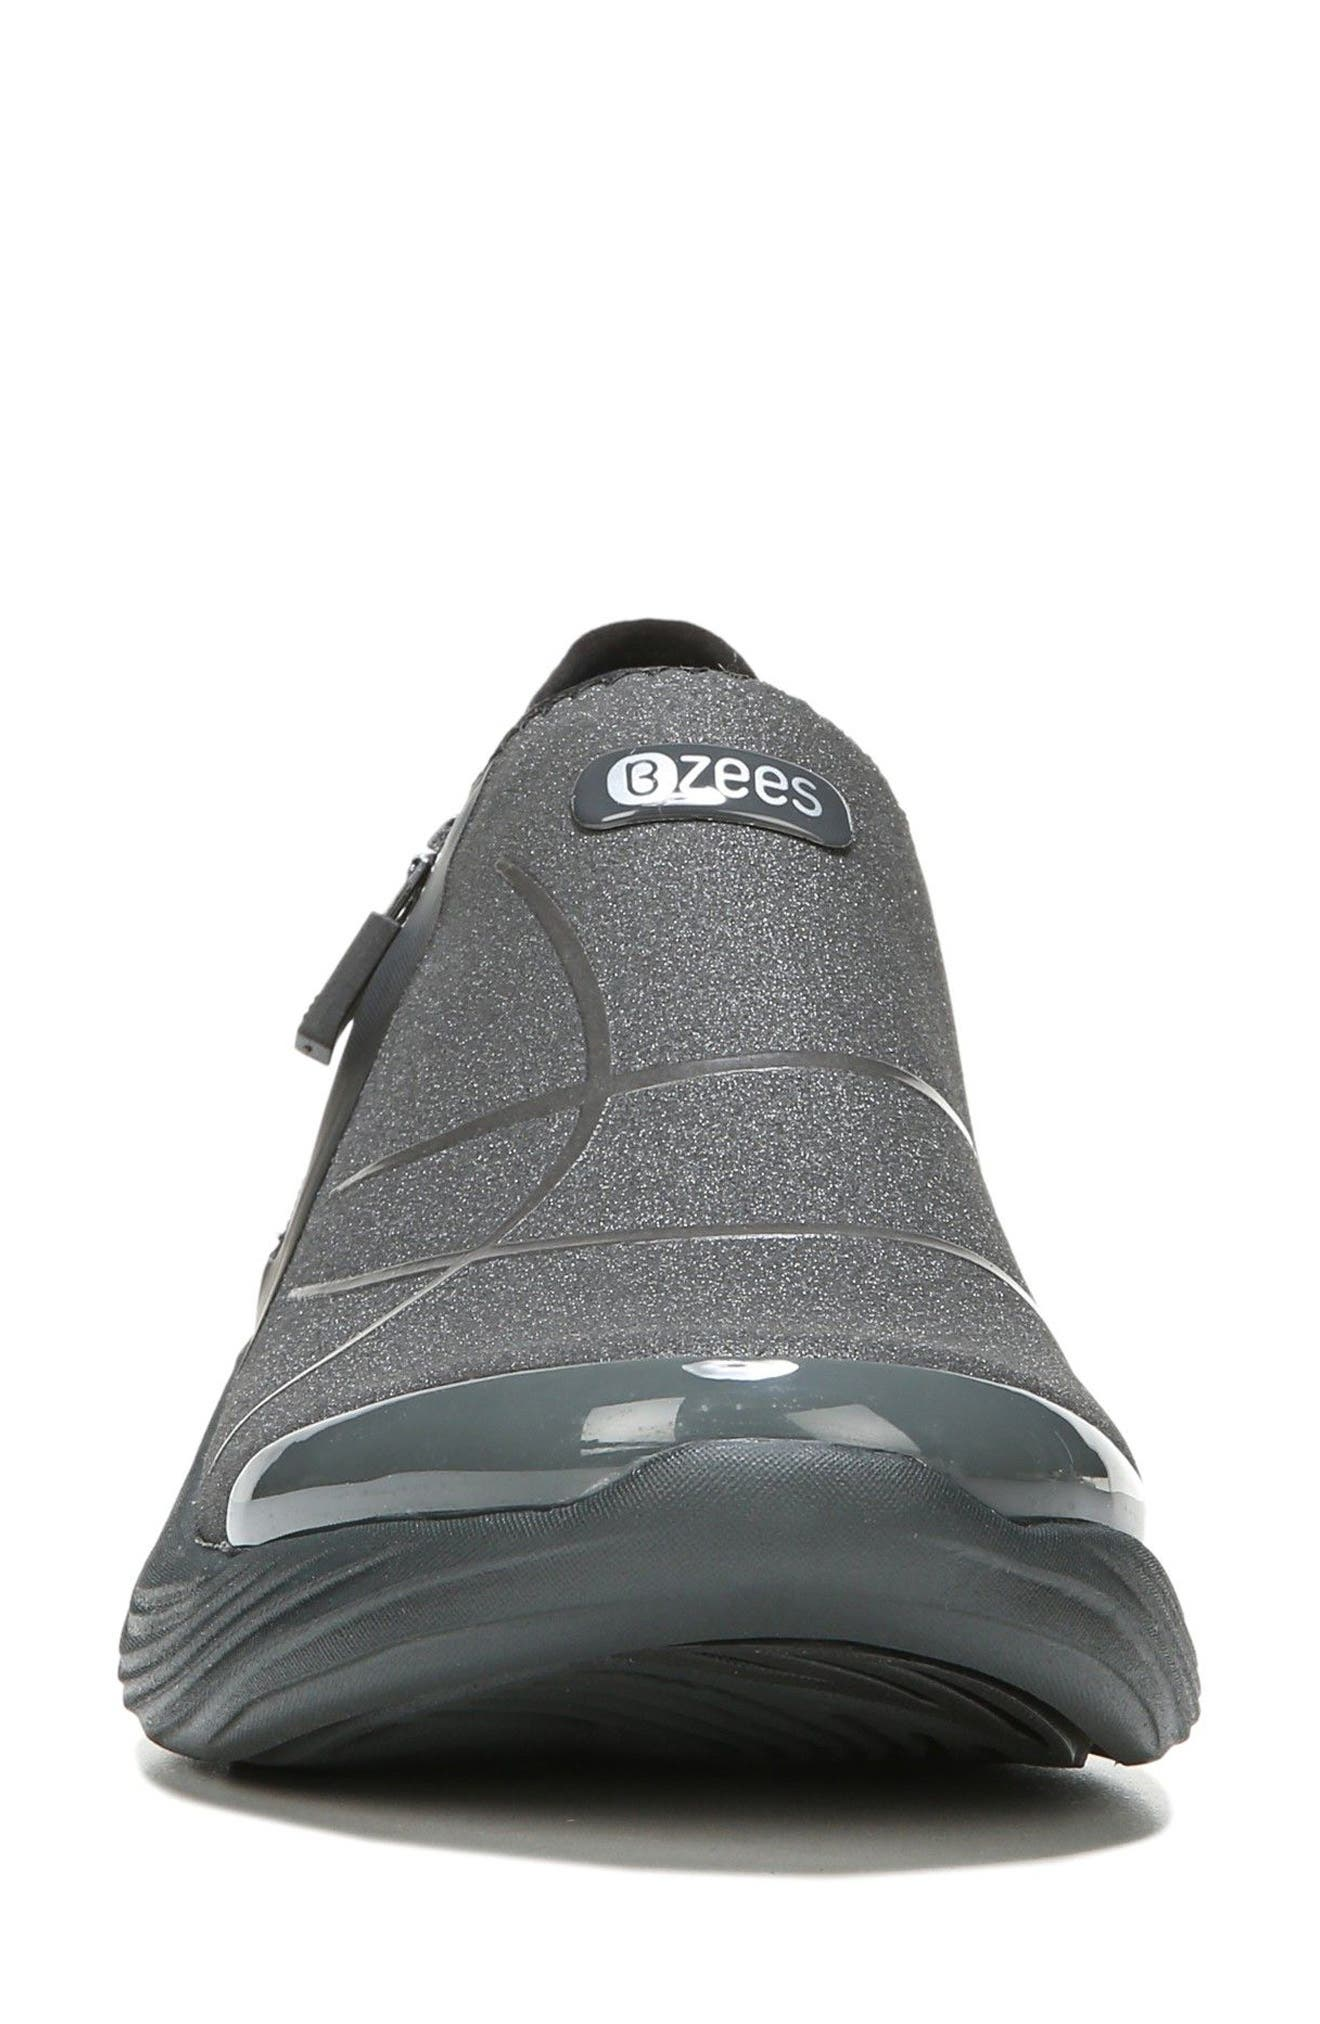 Trilogy Slip-On Sneaker,                             Alternate thumbnail 4, color,                             Grey Fabric